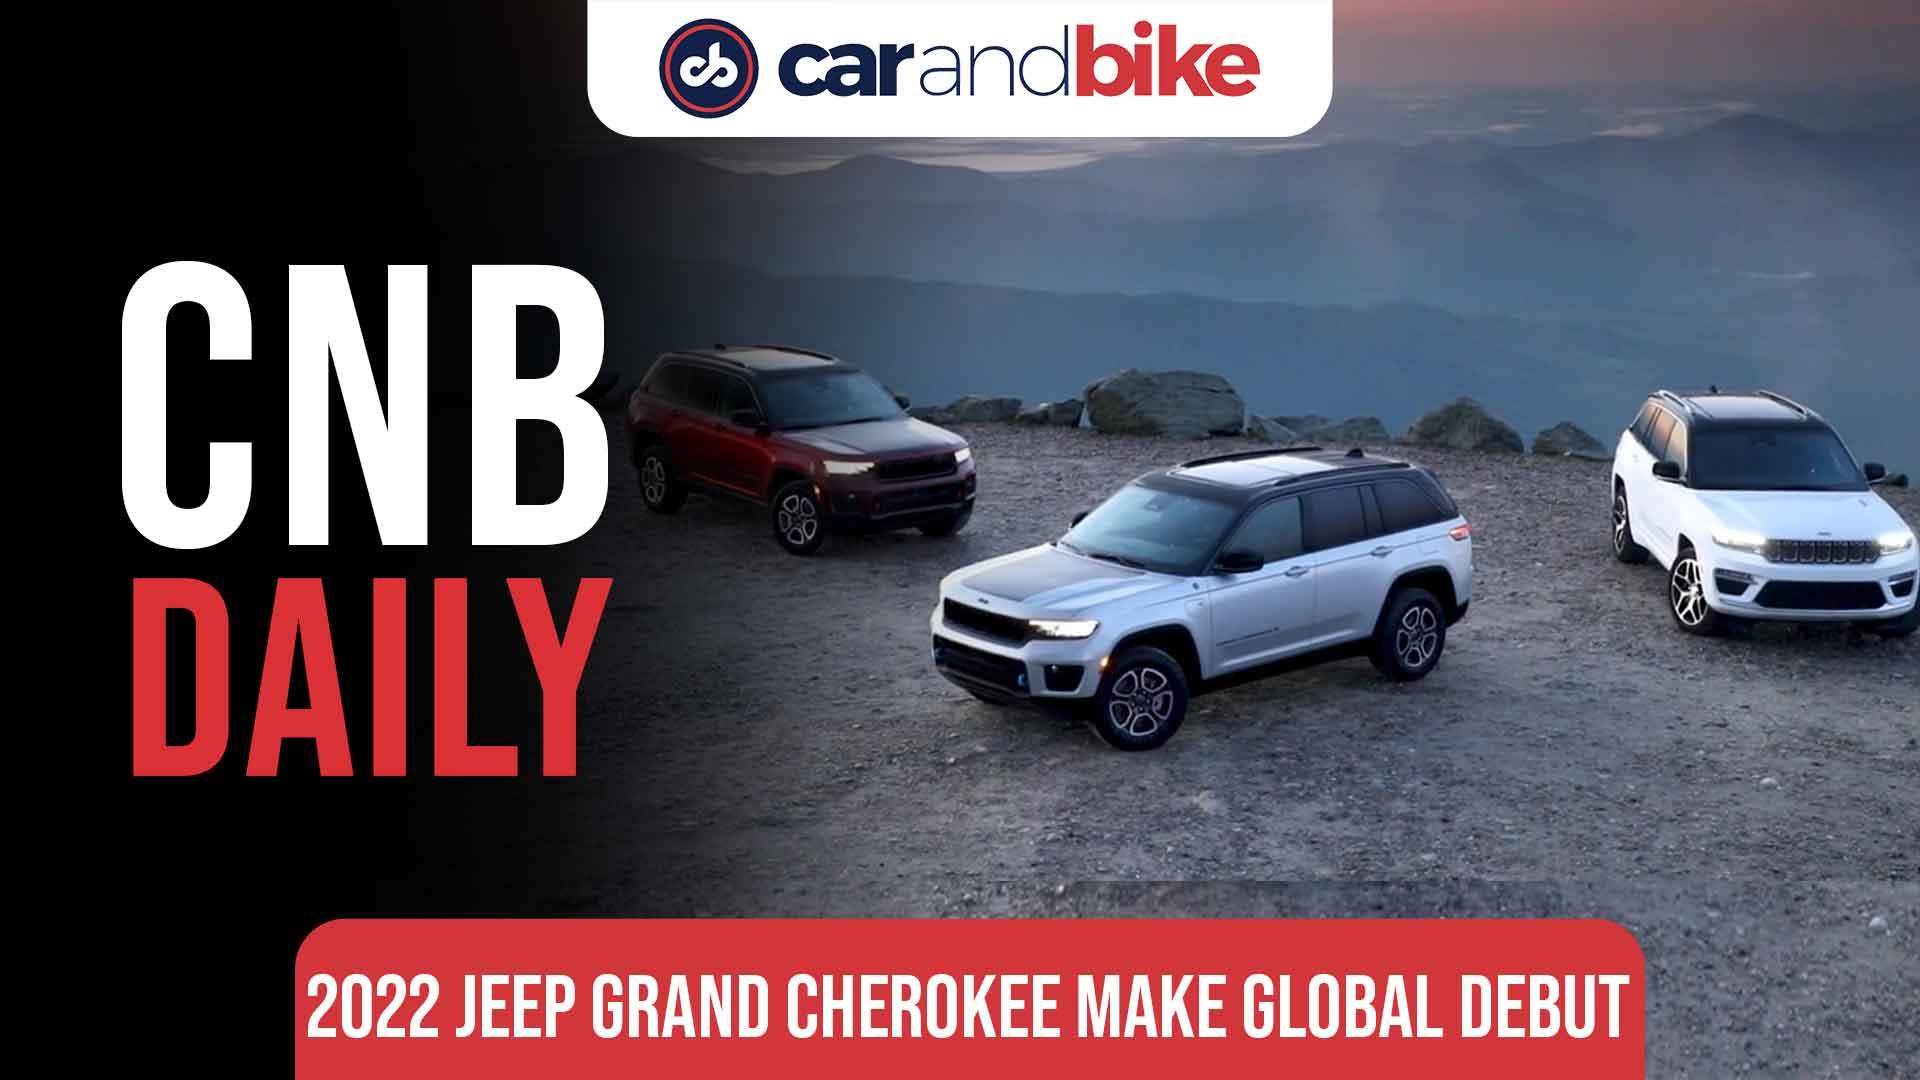 2022 Jeep Grand Cherokee makes global debut